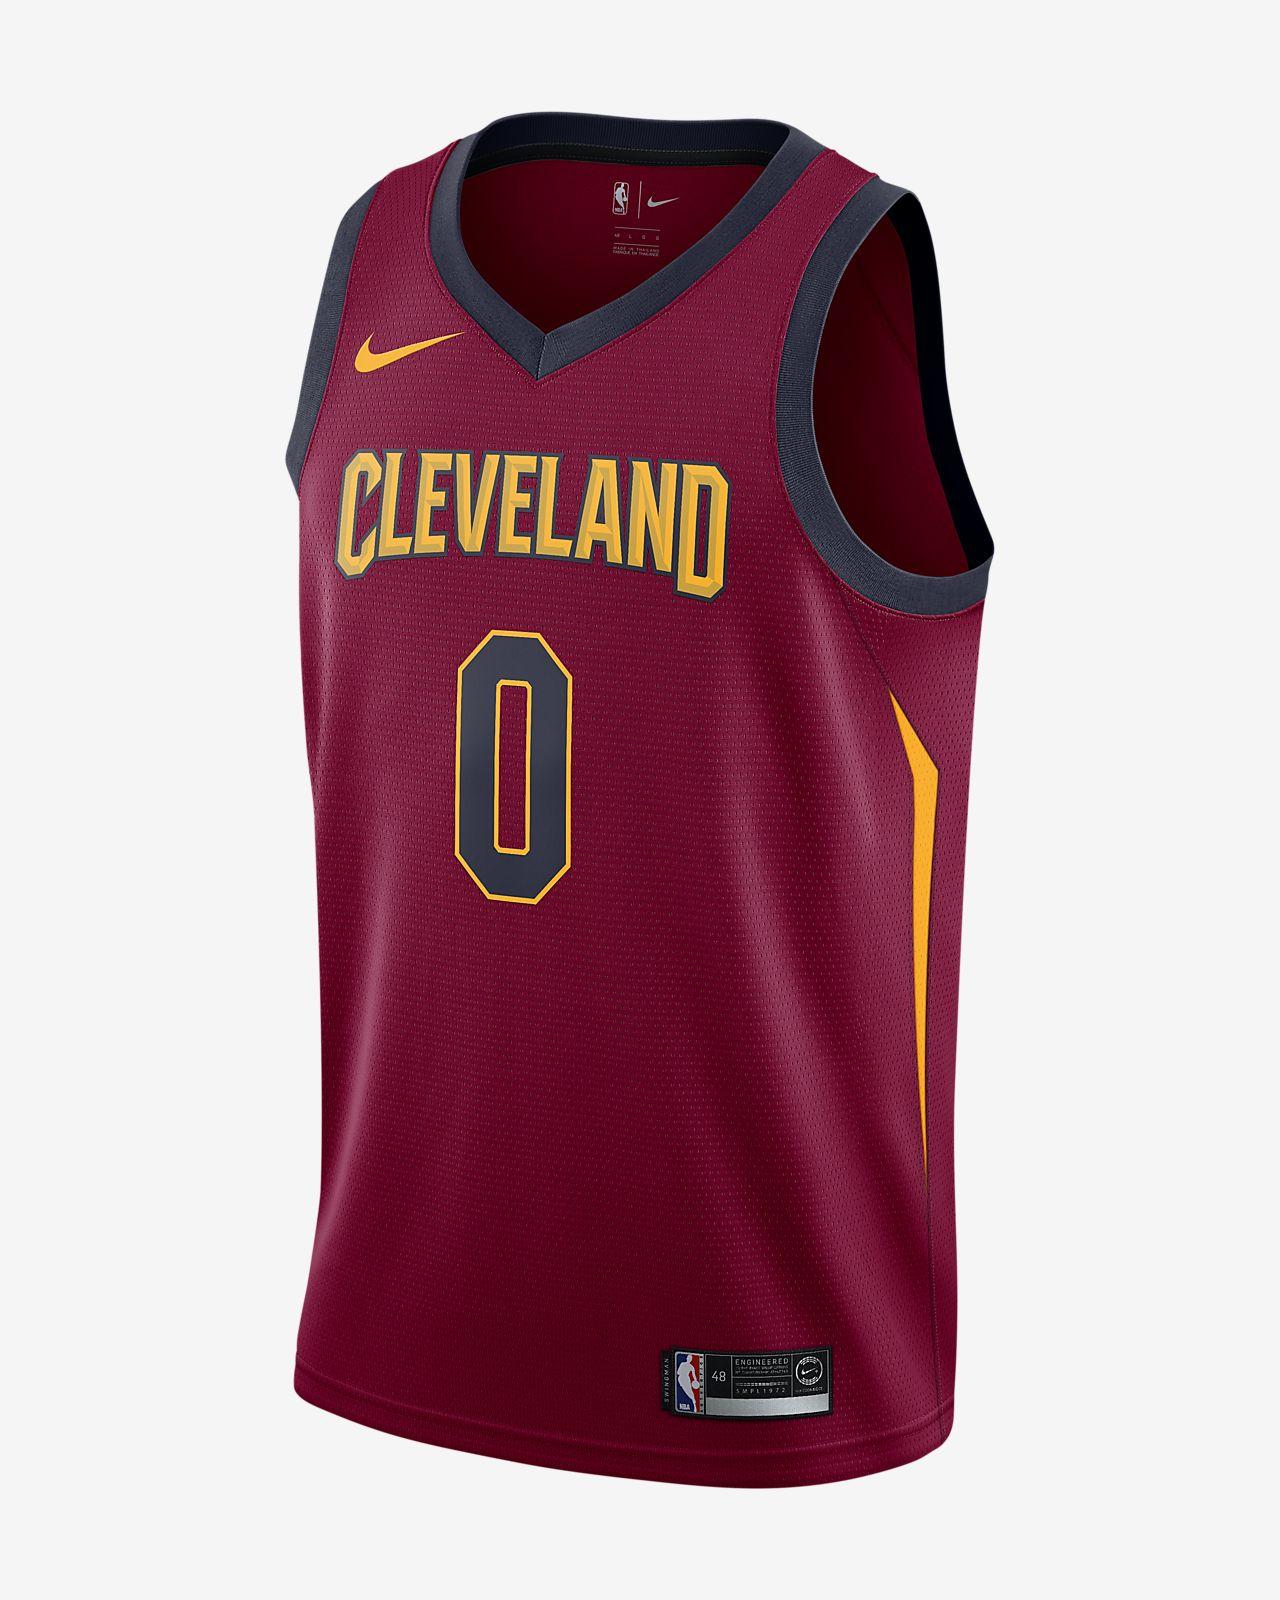 Camiseta conectada Nike NBA para hombre Kevin Love Icon Edition Swingman Jersey (Cleveland Cavaliers)